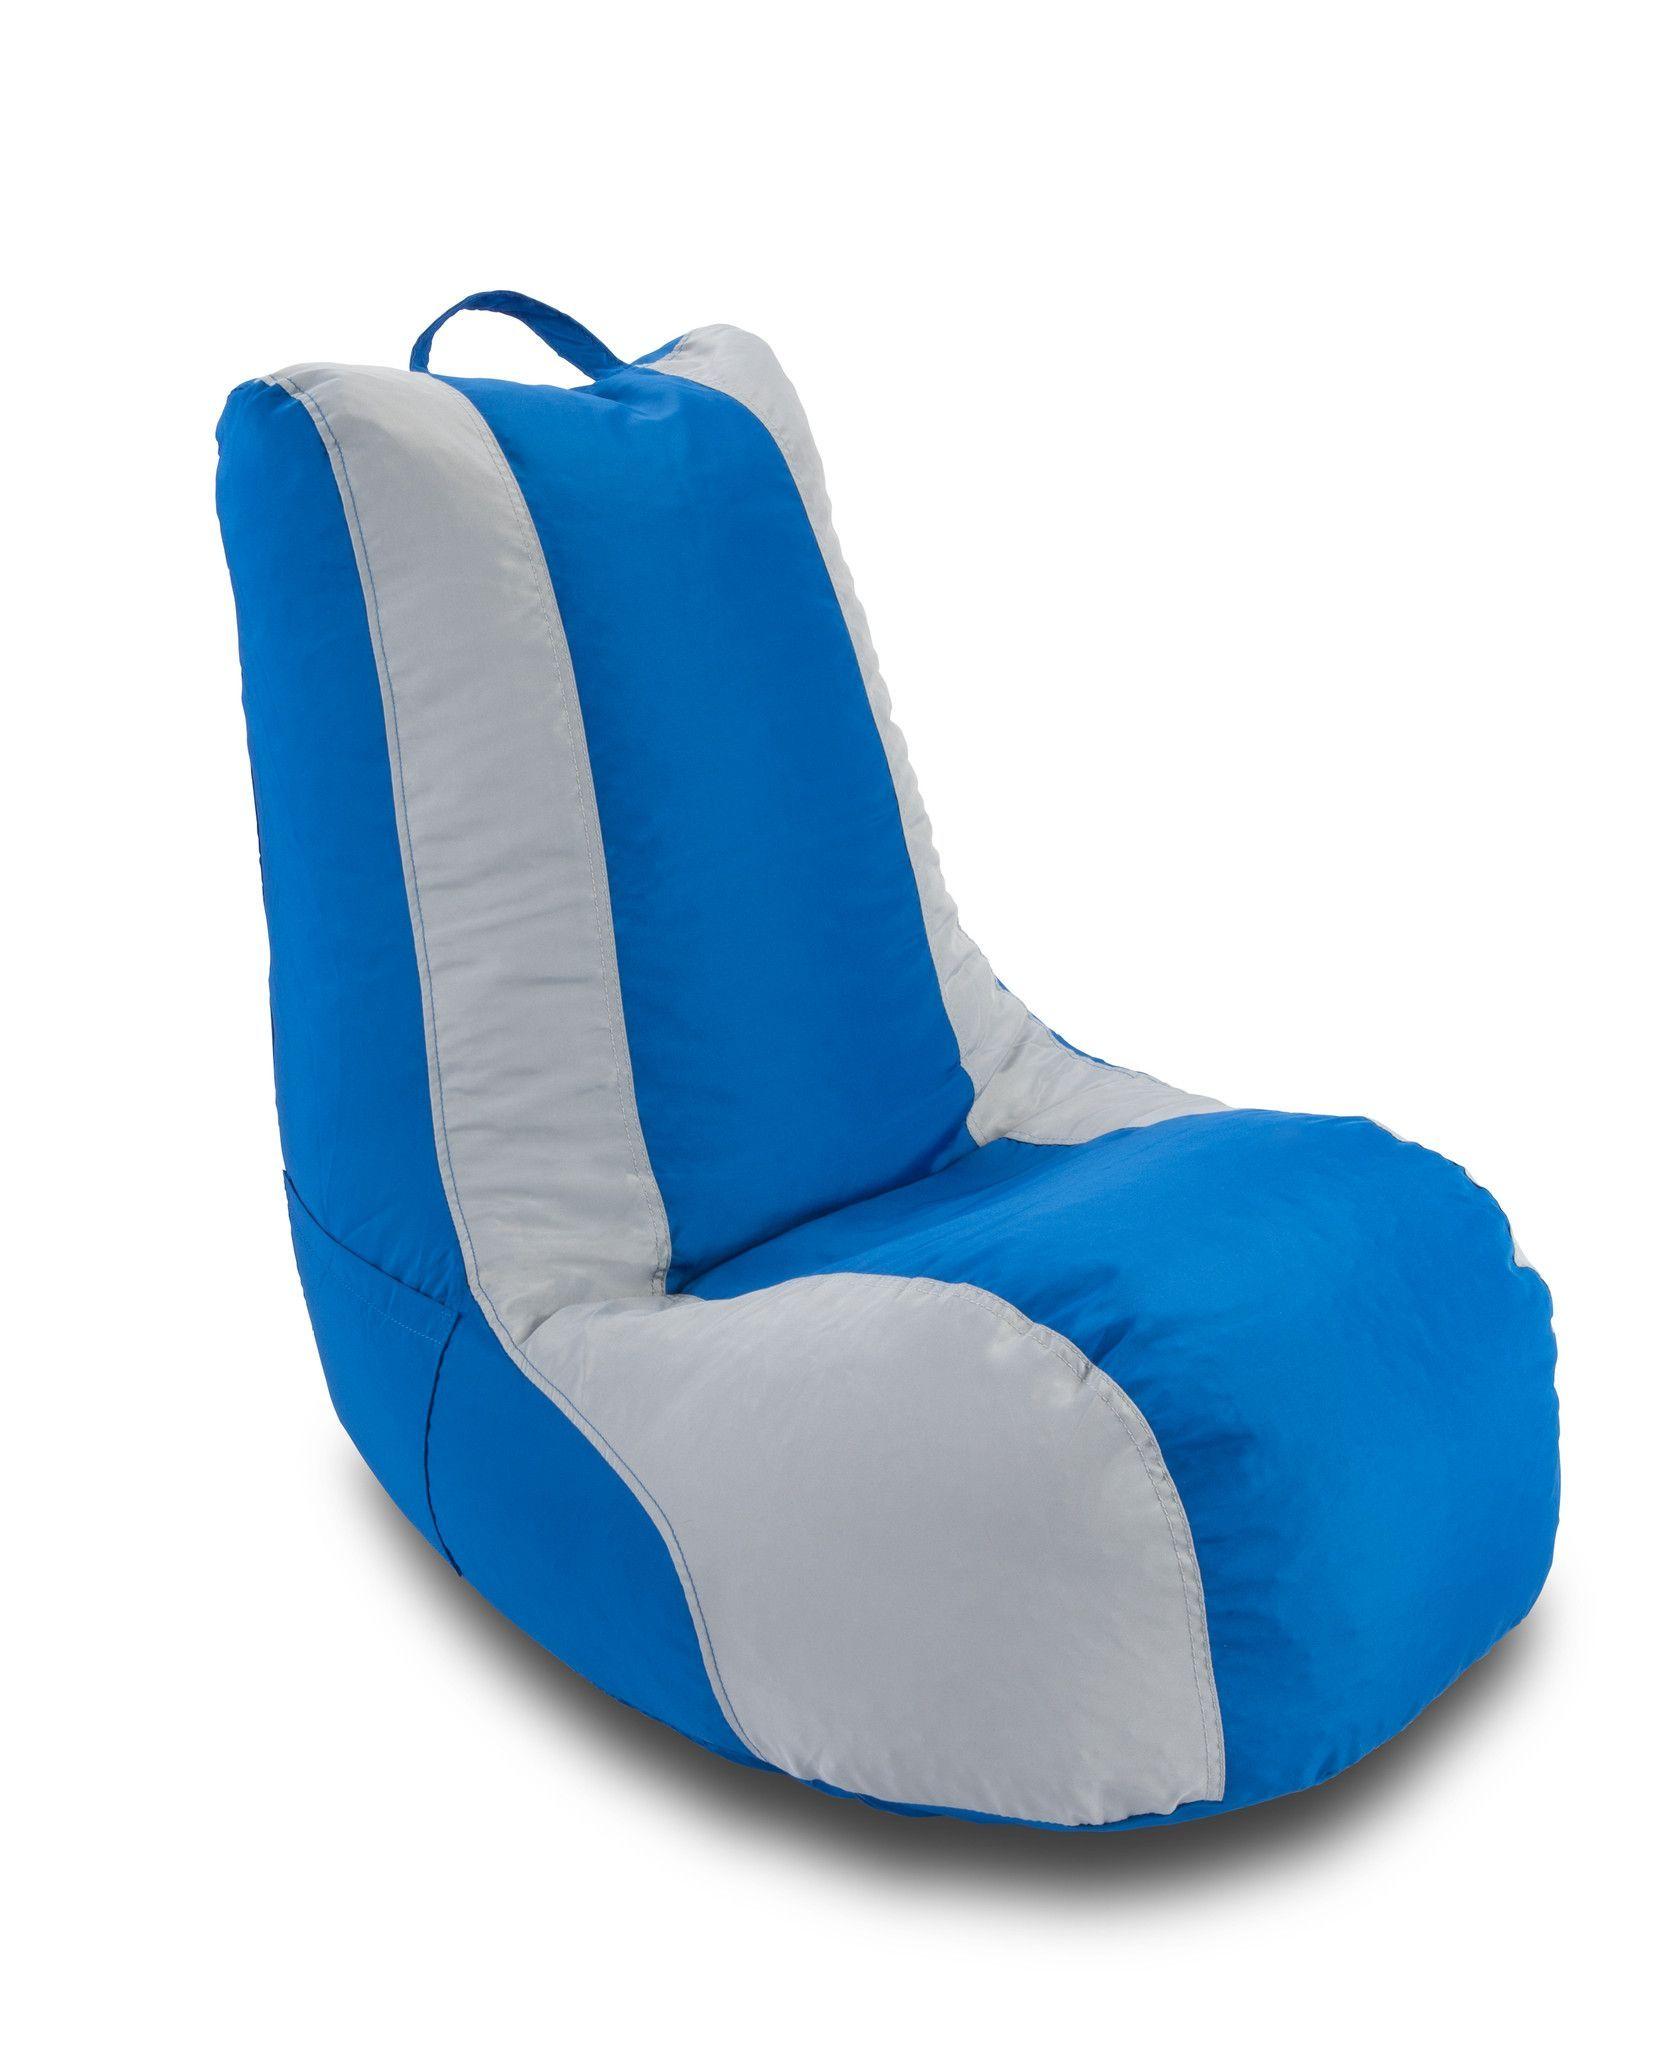 Michael Anthony Furniture School 2 Color Video Bag Blue